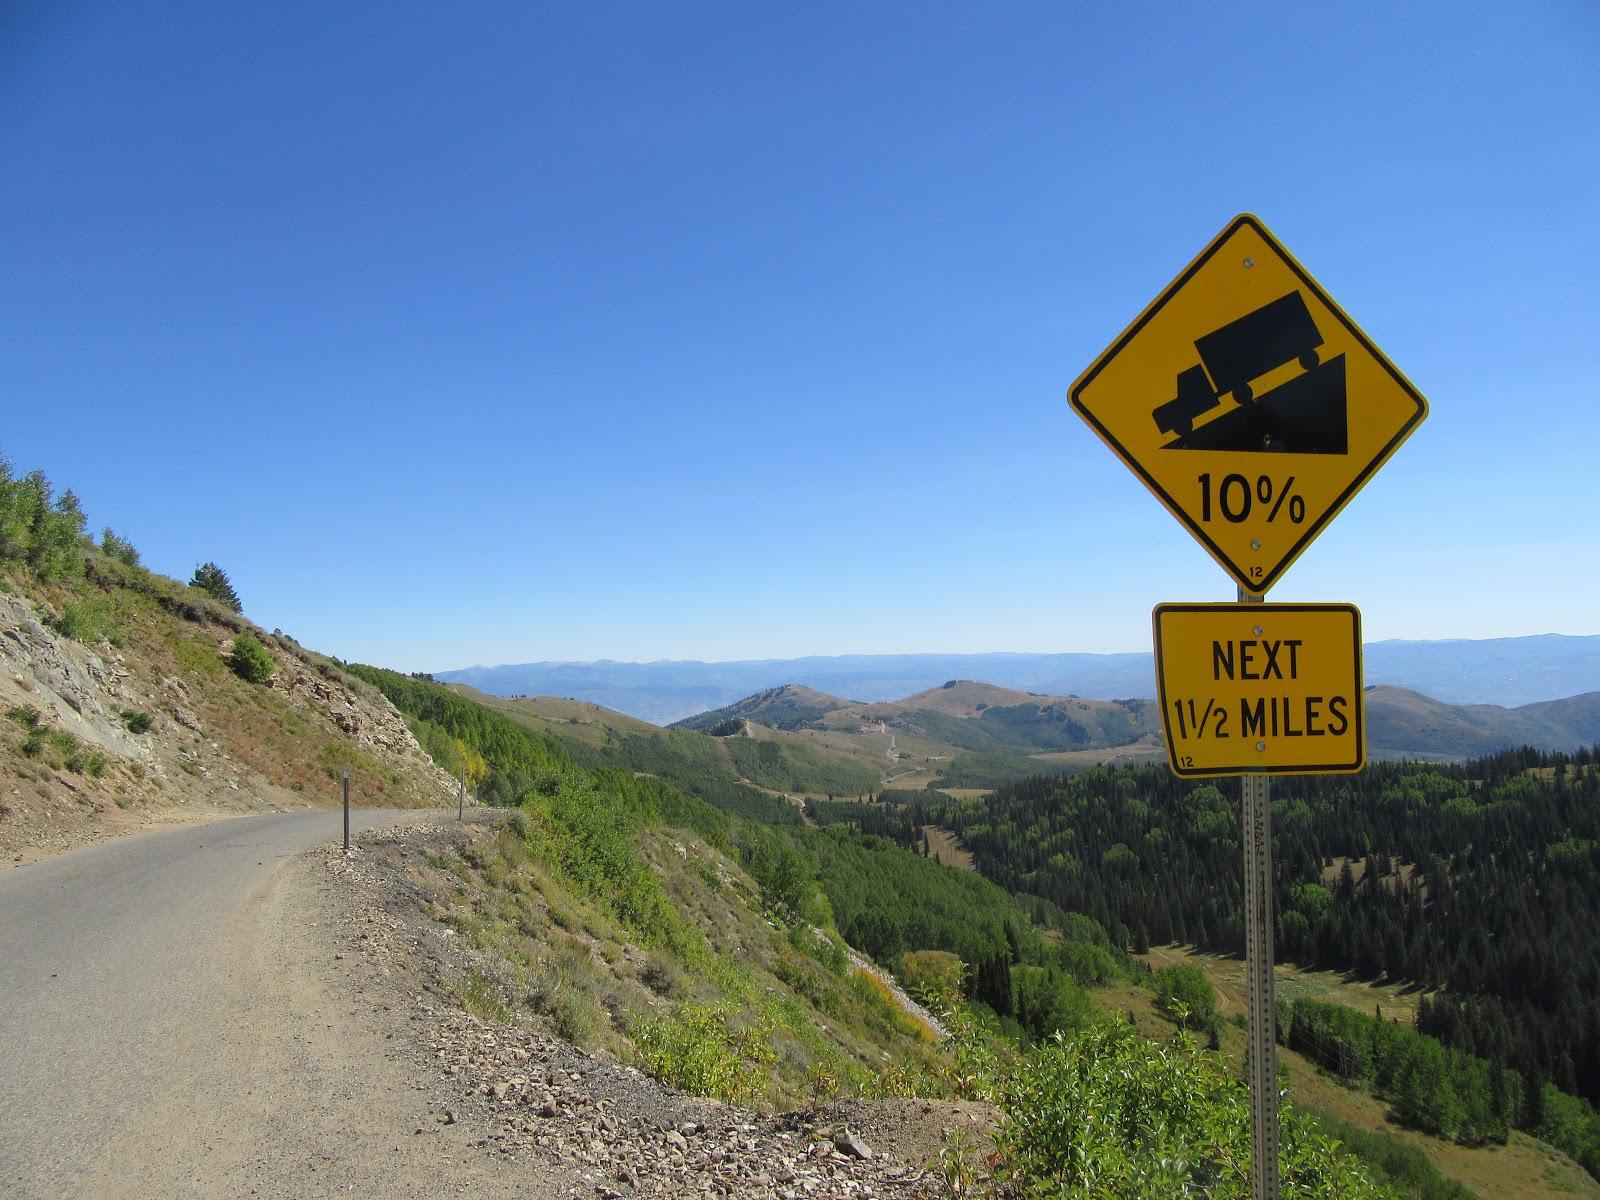 Steep grade sign at the top of Guardsman Pass